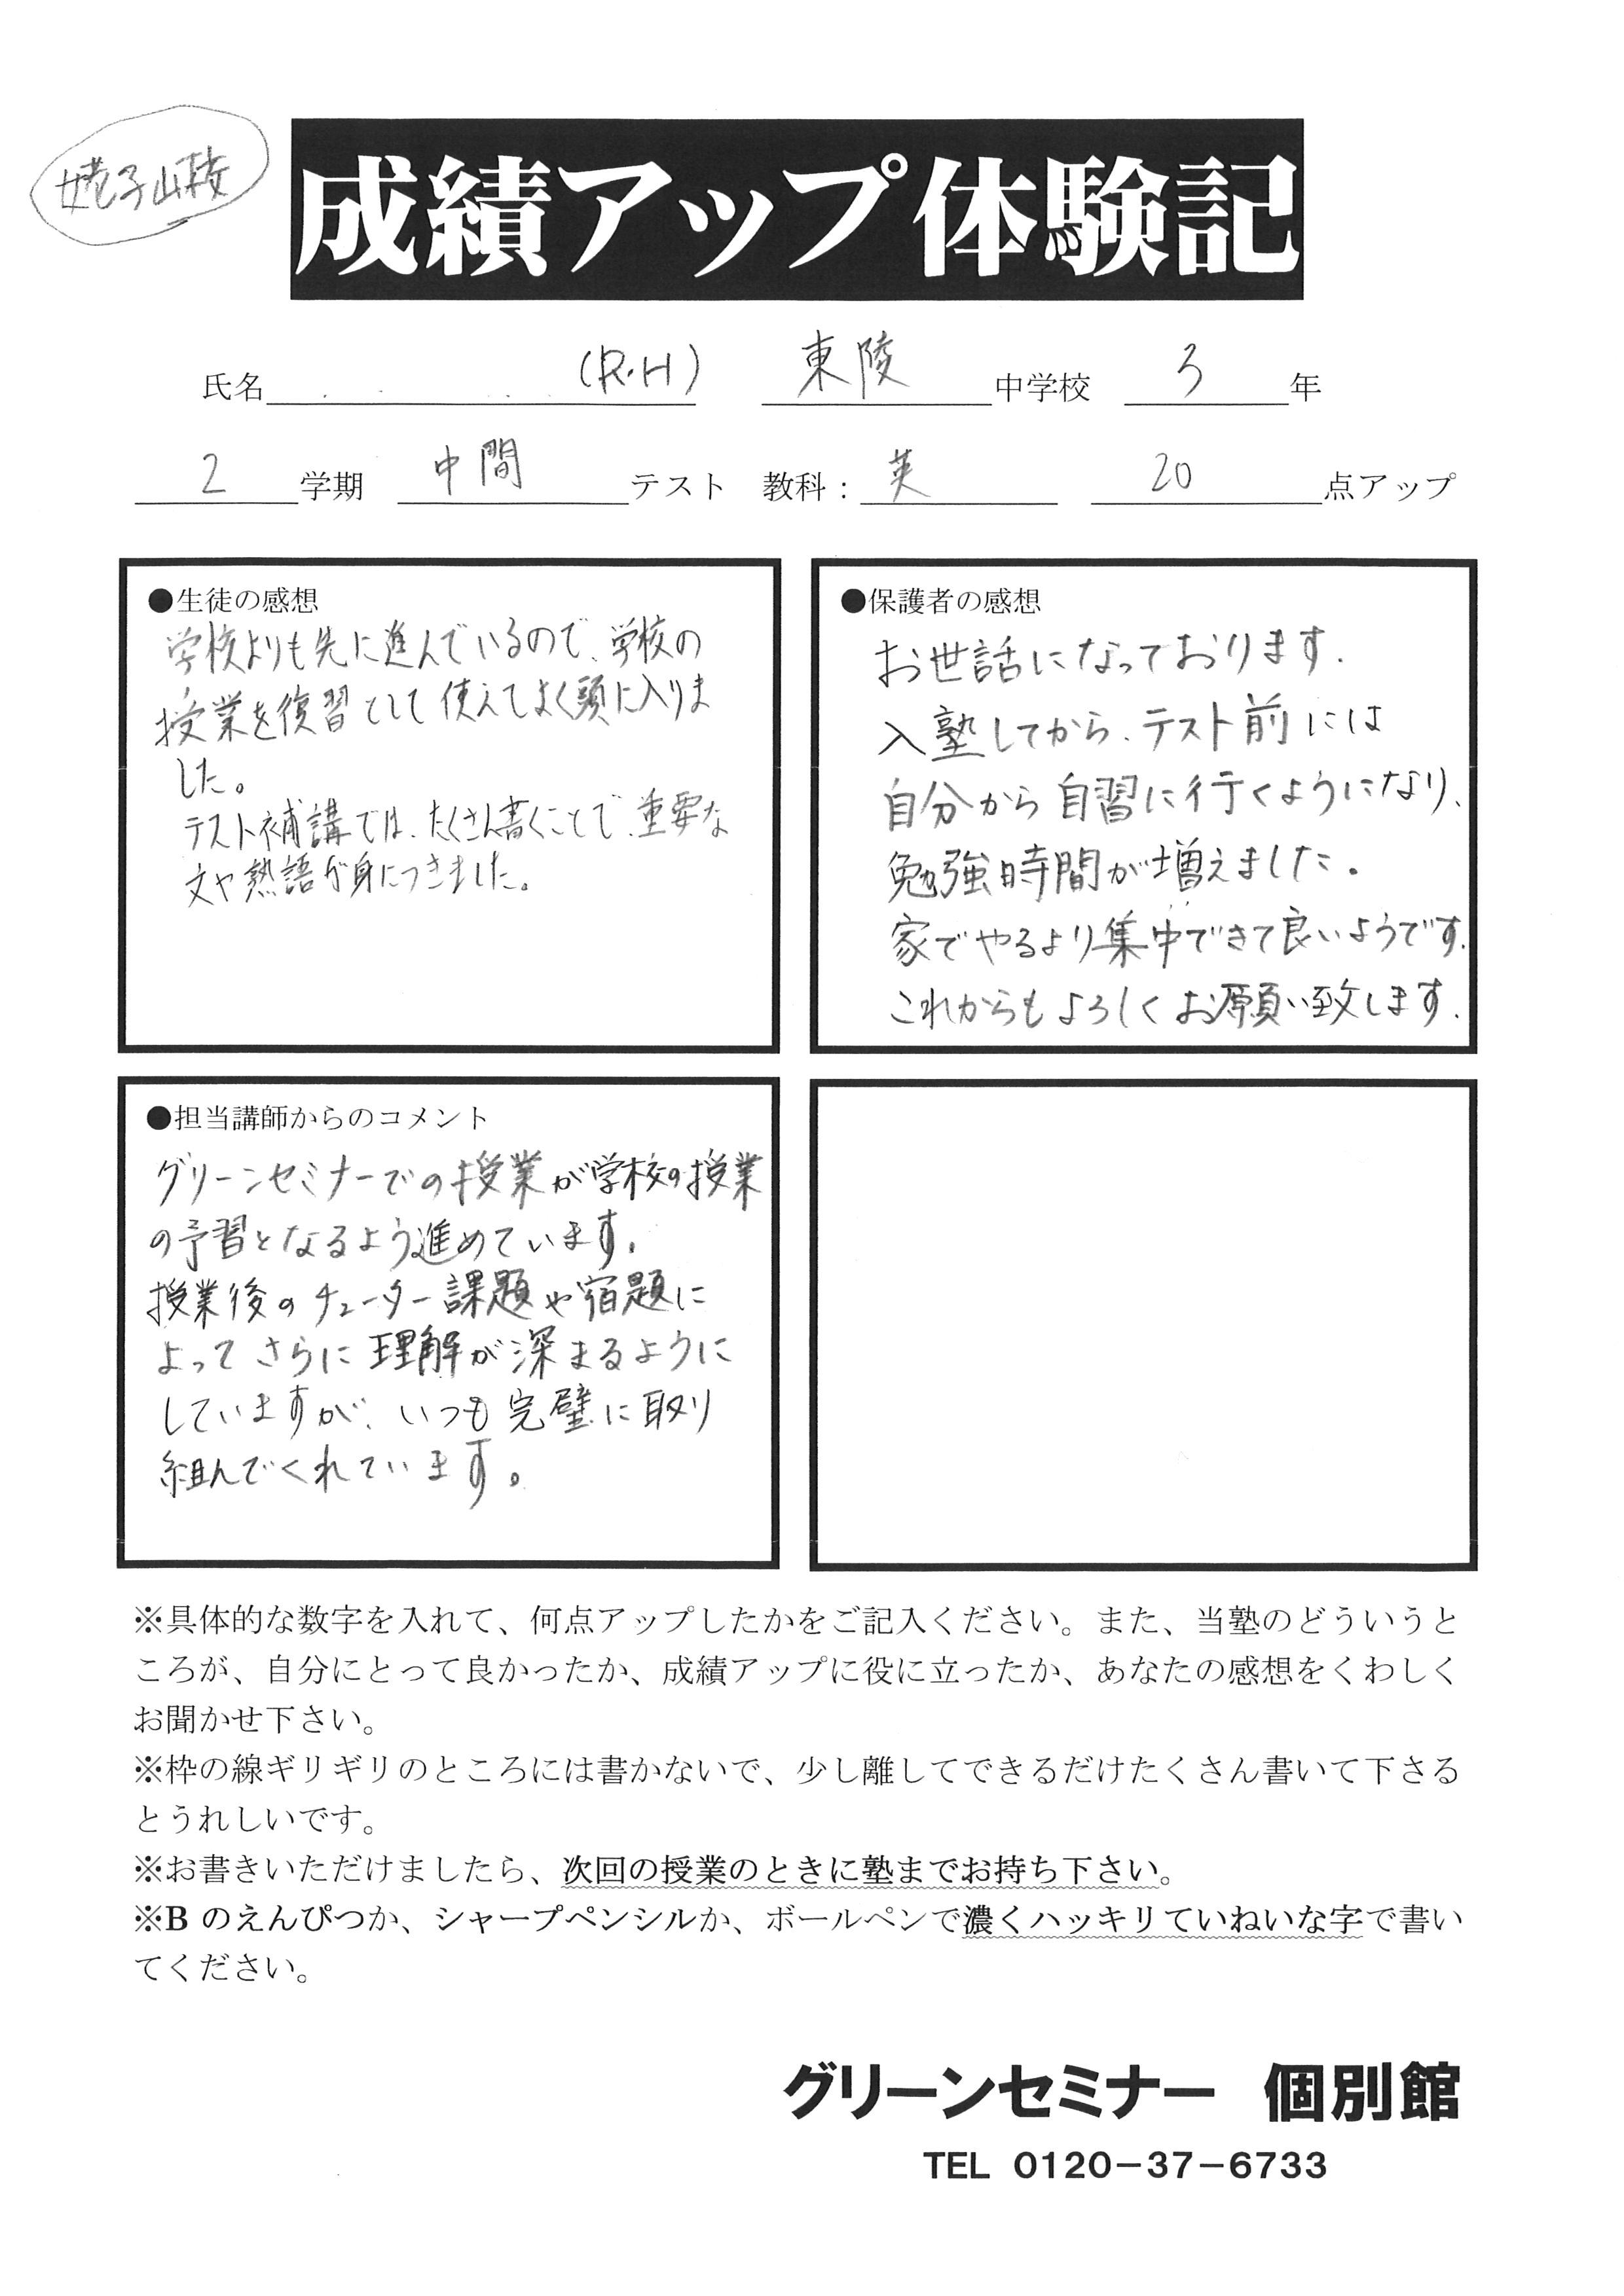 20160314141303_00003